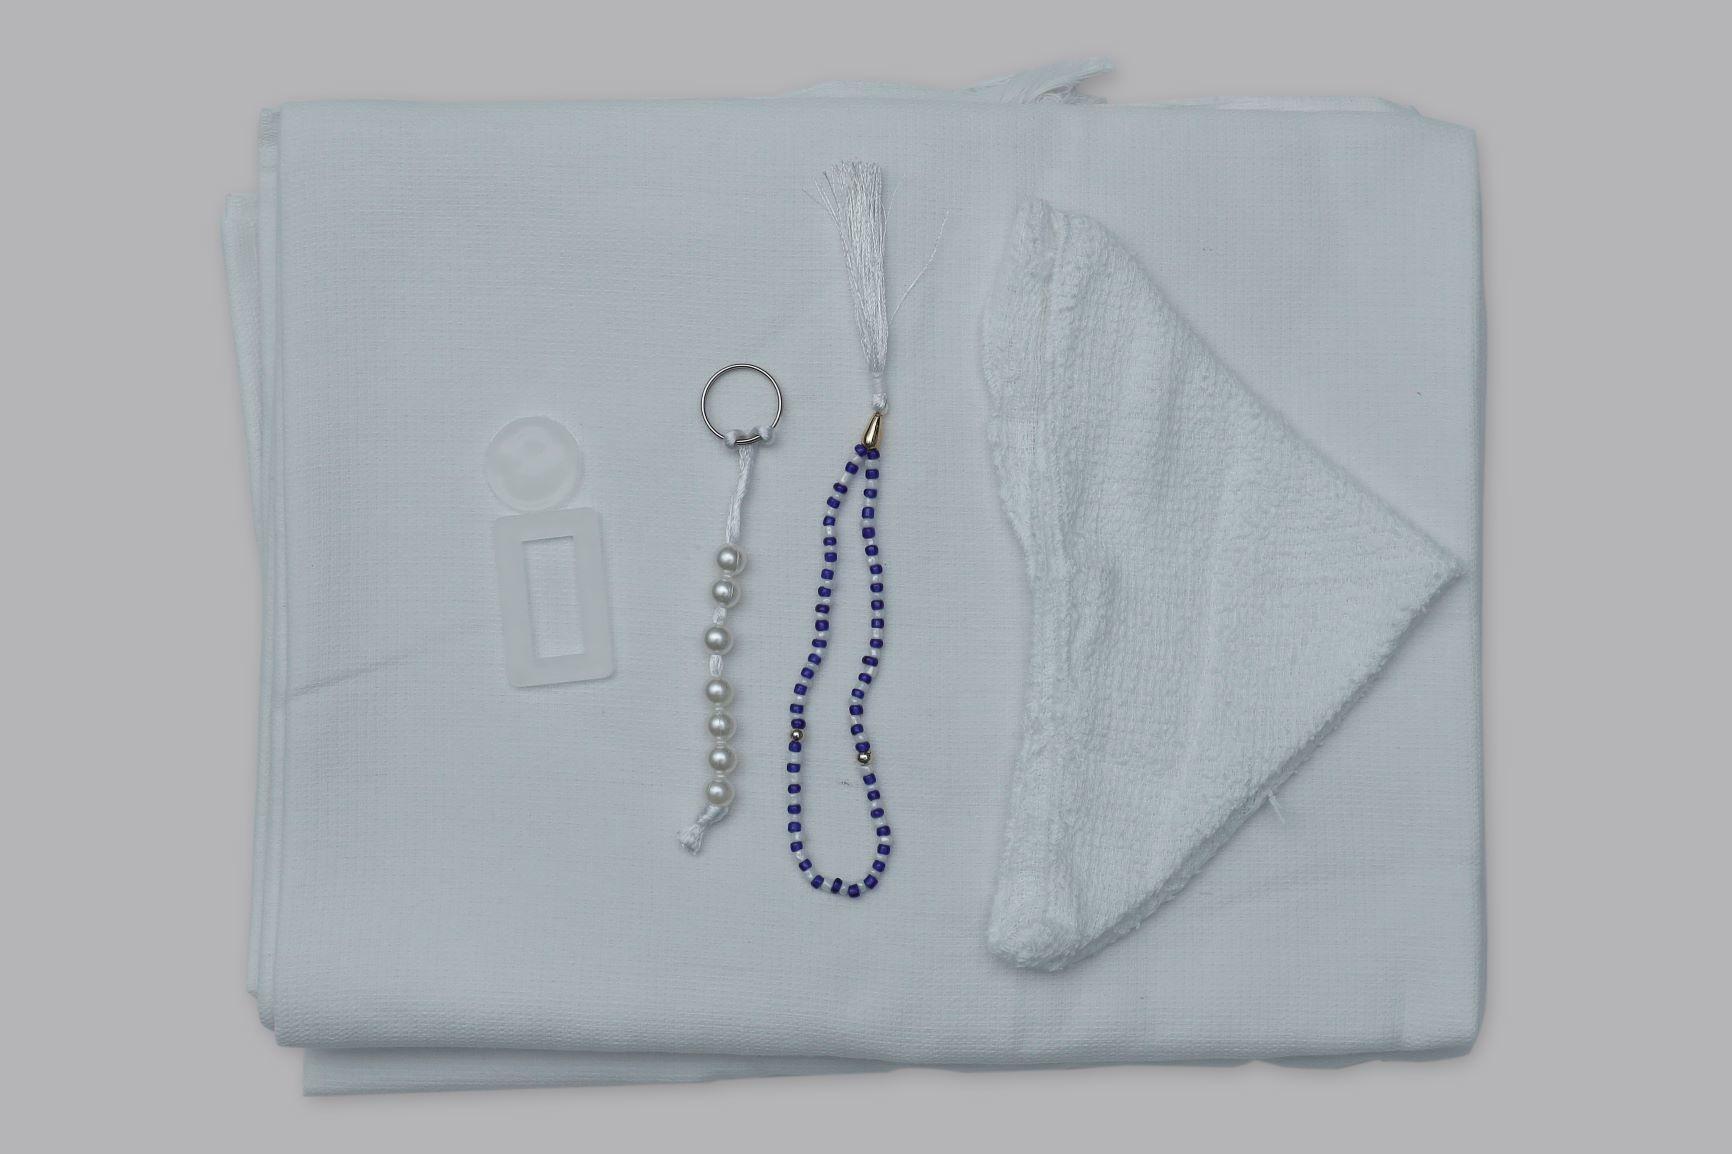 White Cotton Fabric Minara Haj Towel